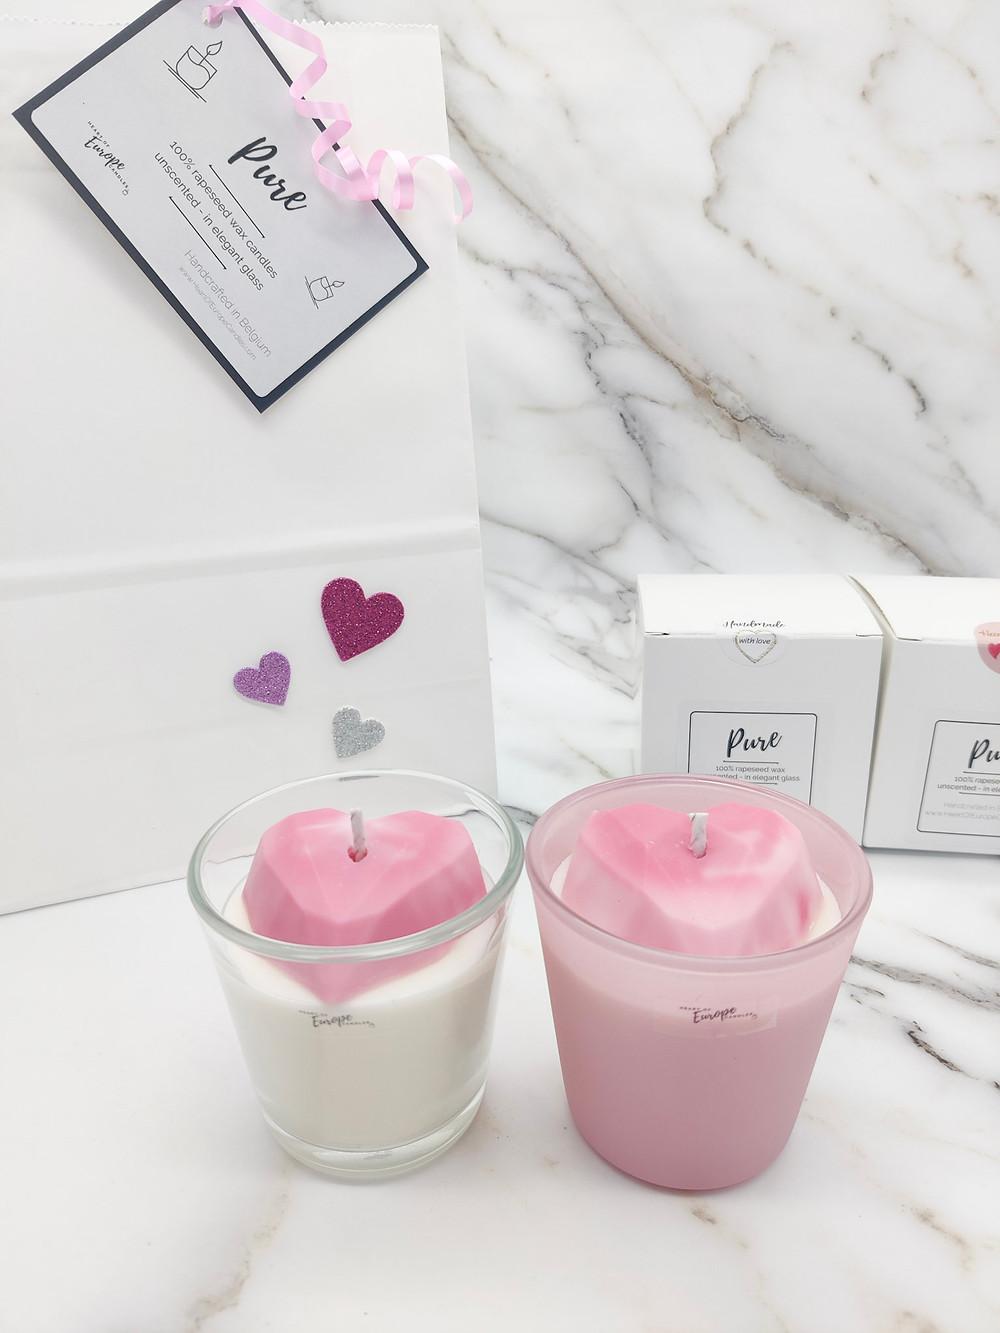 rapeseed candle